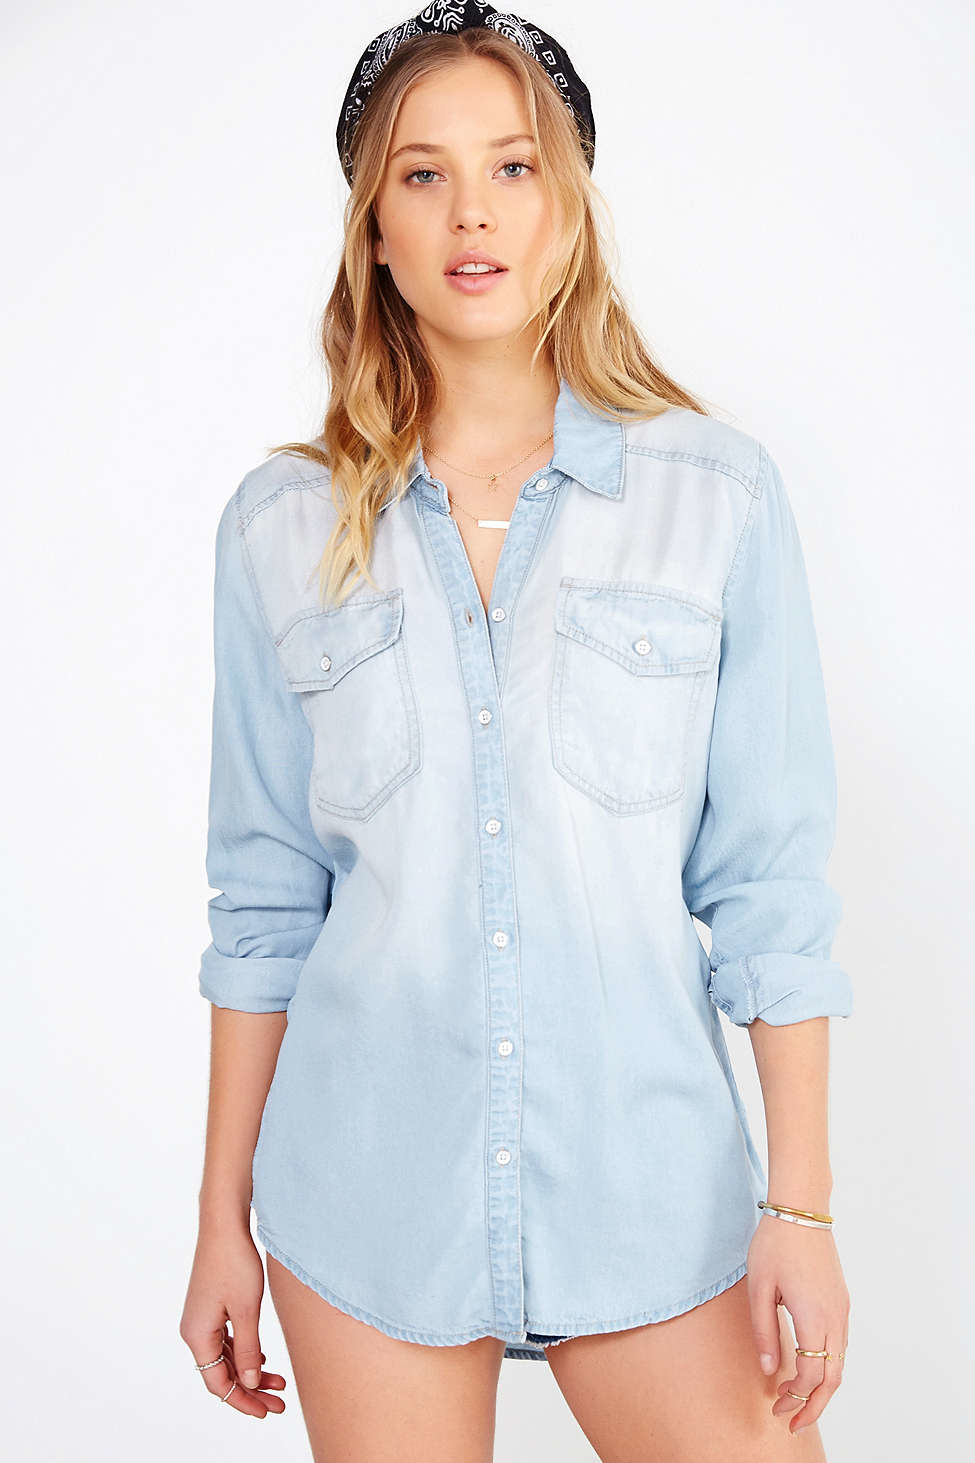 ba0da1adf BDG Drapey Chambray Button-down Shirt in Blue - Lyst